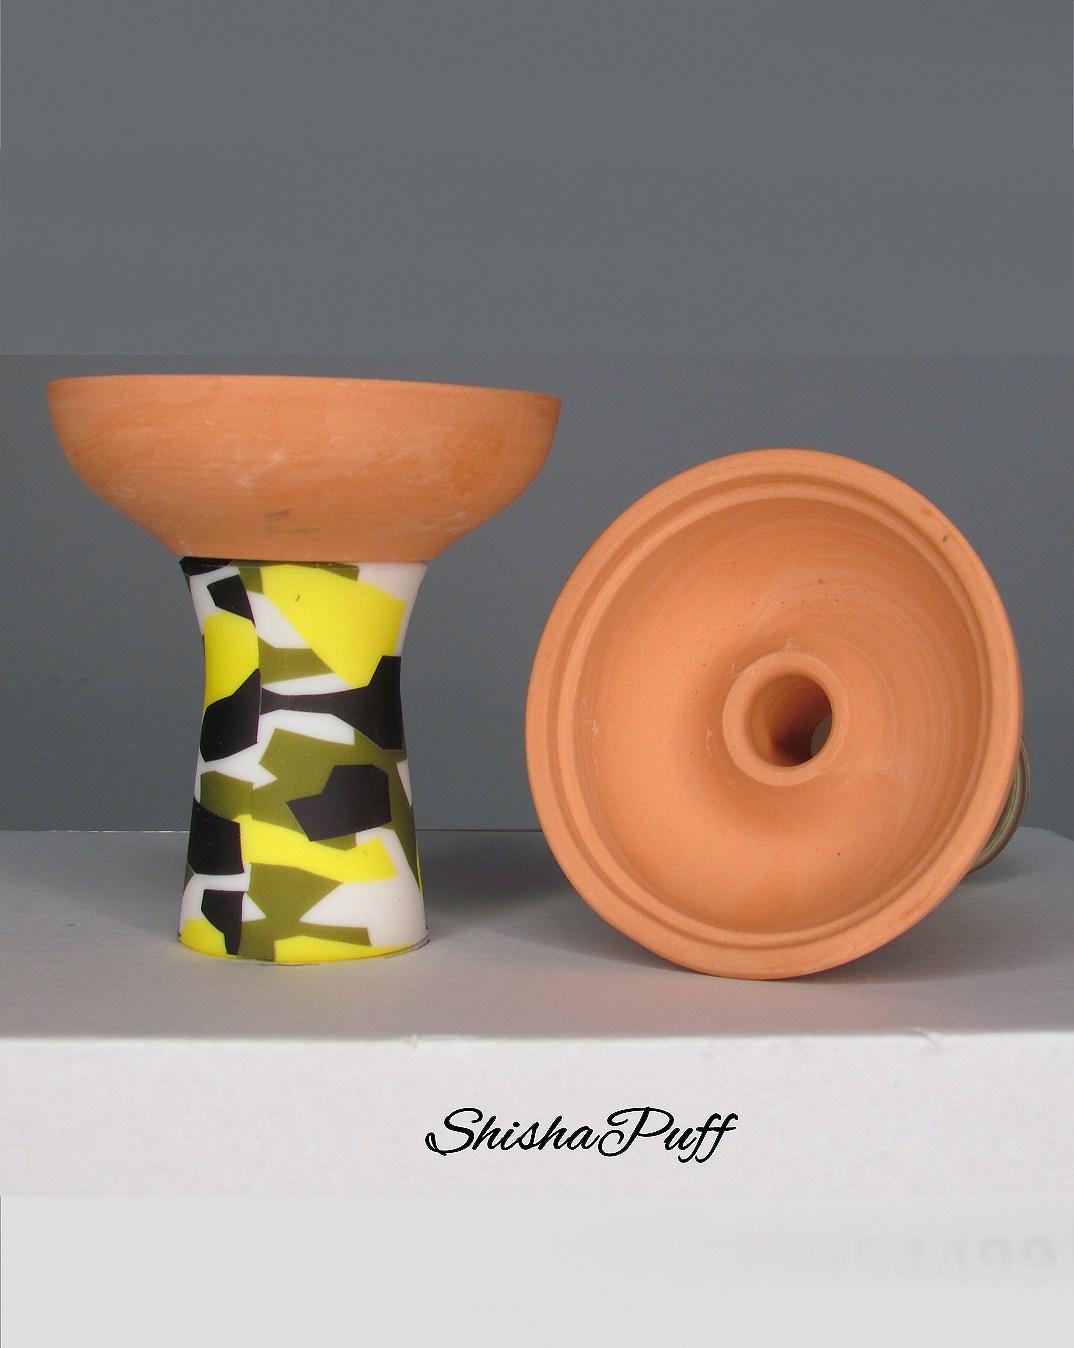 Silicone Ceramic Head Army Yellow Round bowl hookah For Kaloud - Shisha Puff Cyprus Hookah